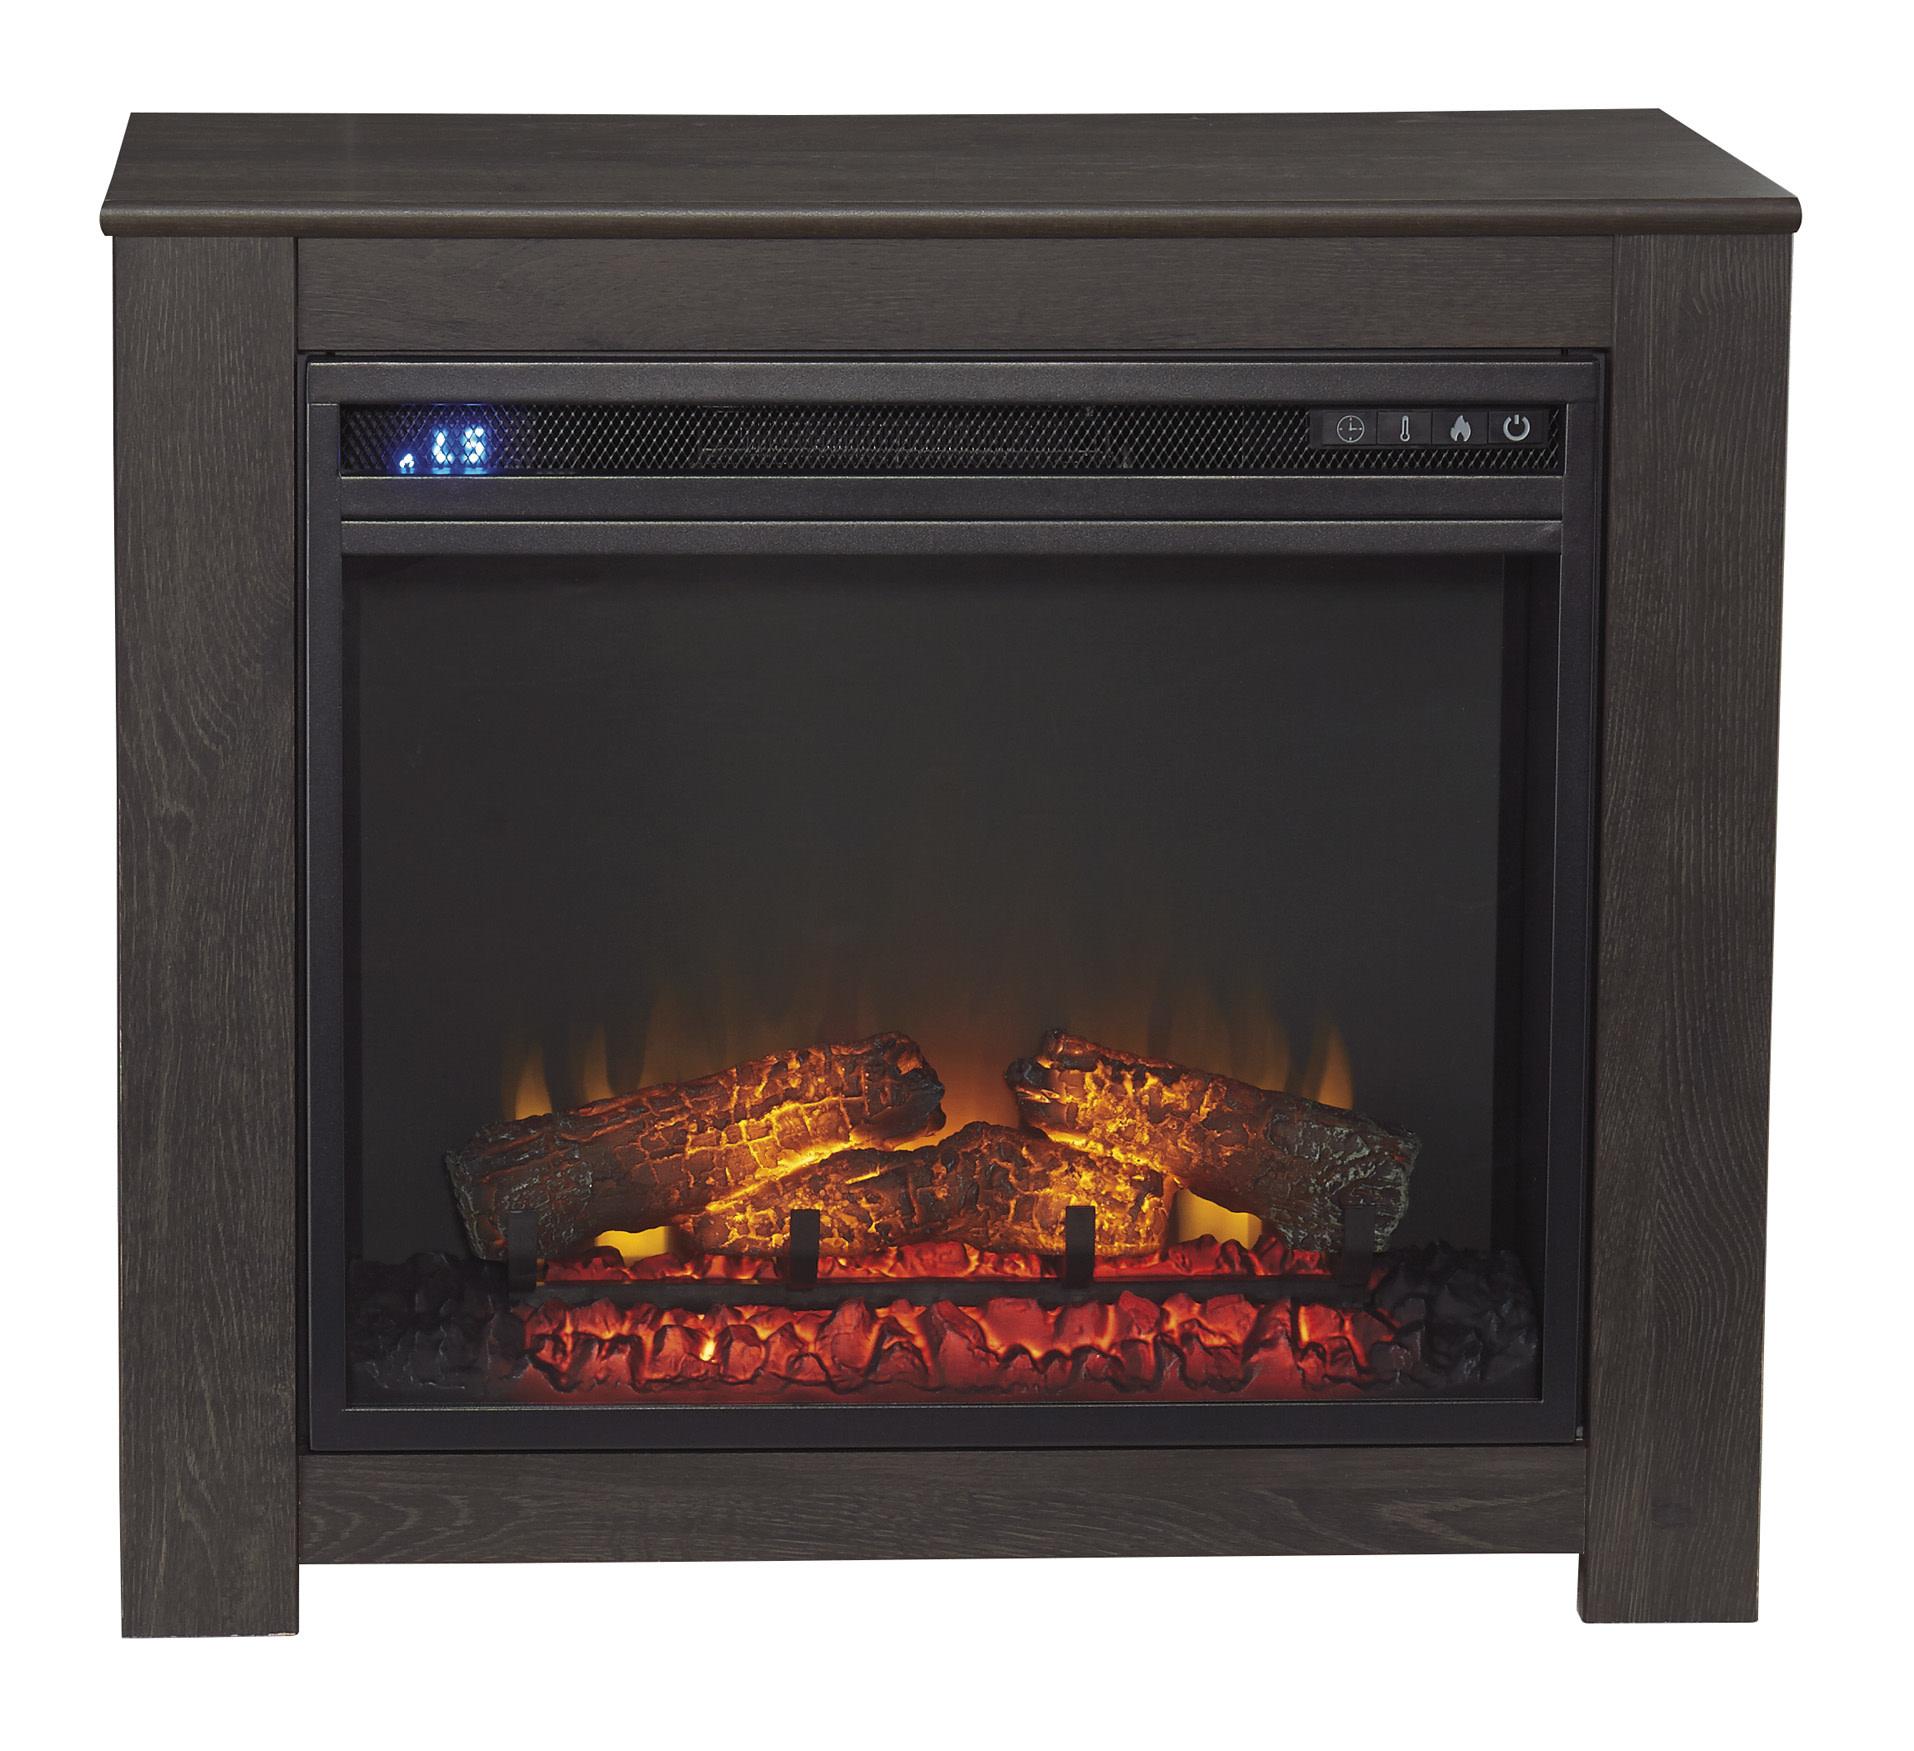 Signature Design Harlinton Fireplace Mantel w/ Fireplace Insert- Black- W325-368